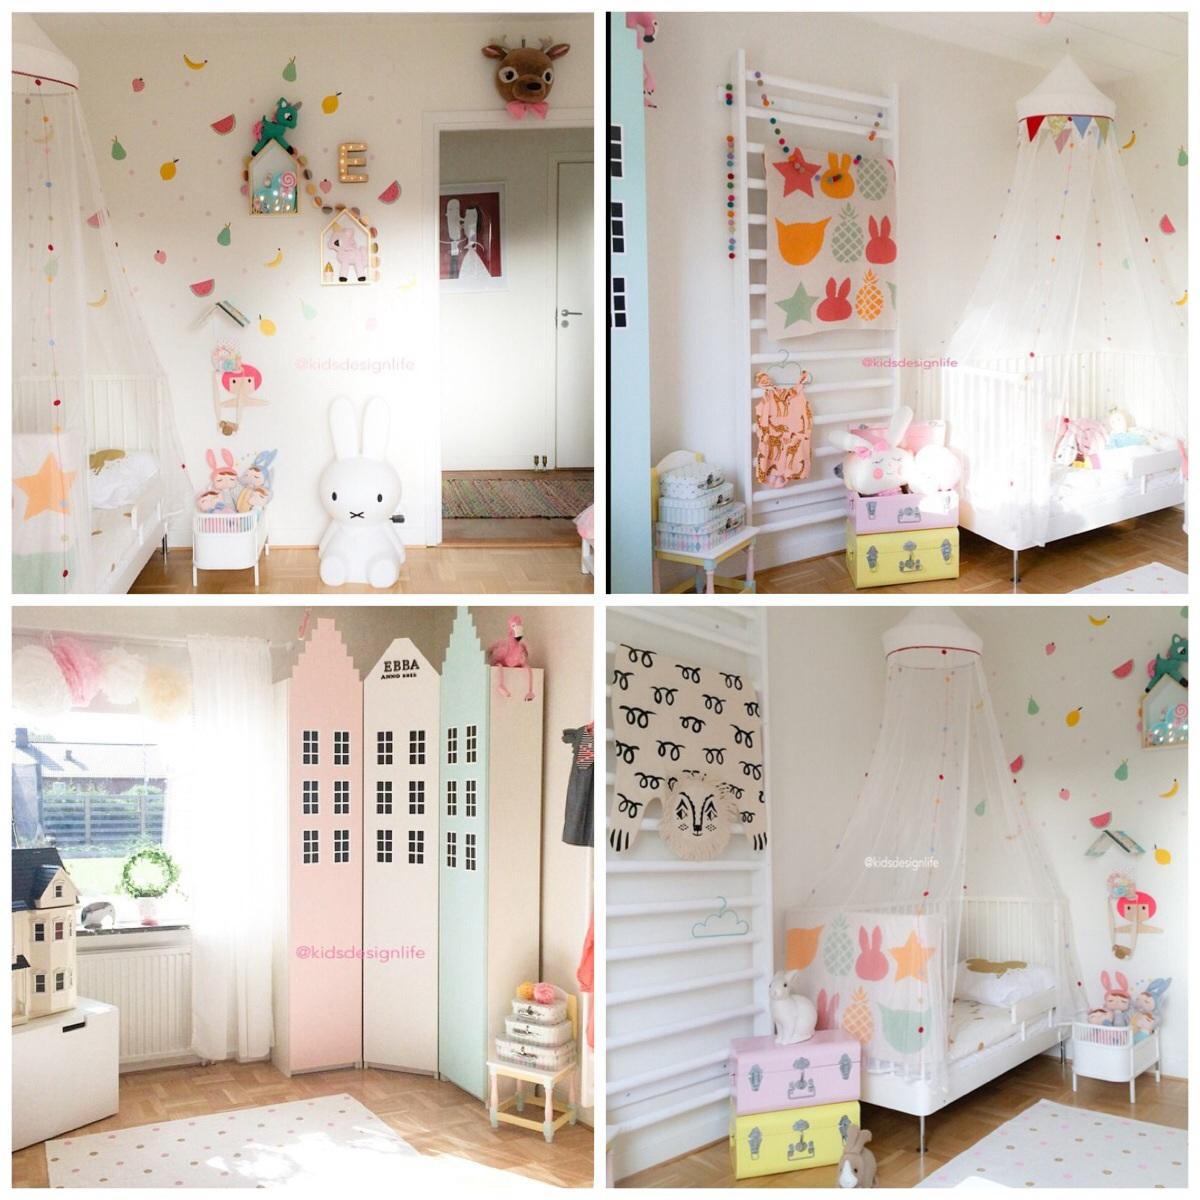 imgbd - ikea slaapkamer kinderkamer ~ de laatste slaapkamer, Deco ideeën